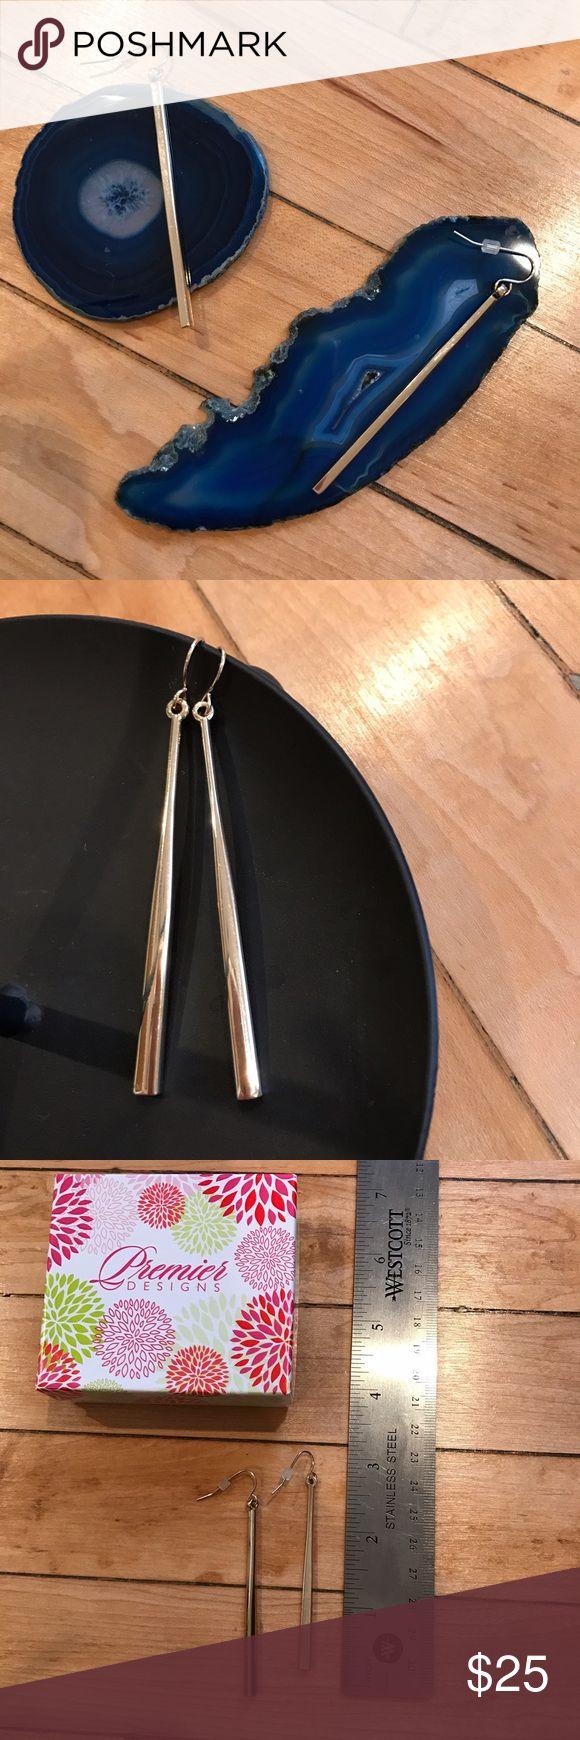 Gold stiletto earrings Beautiful gold stiletto earrings! Come with original Premier Designs box. Premier Designs Jewelry Earrings